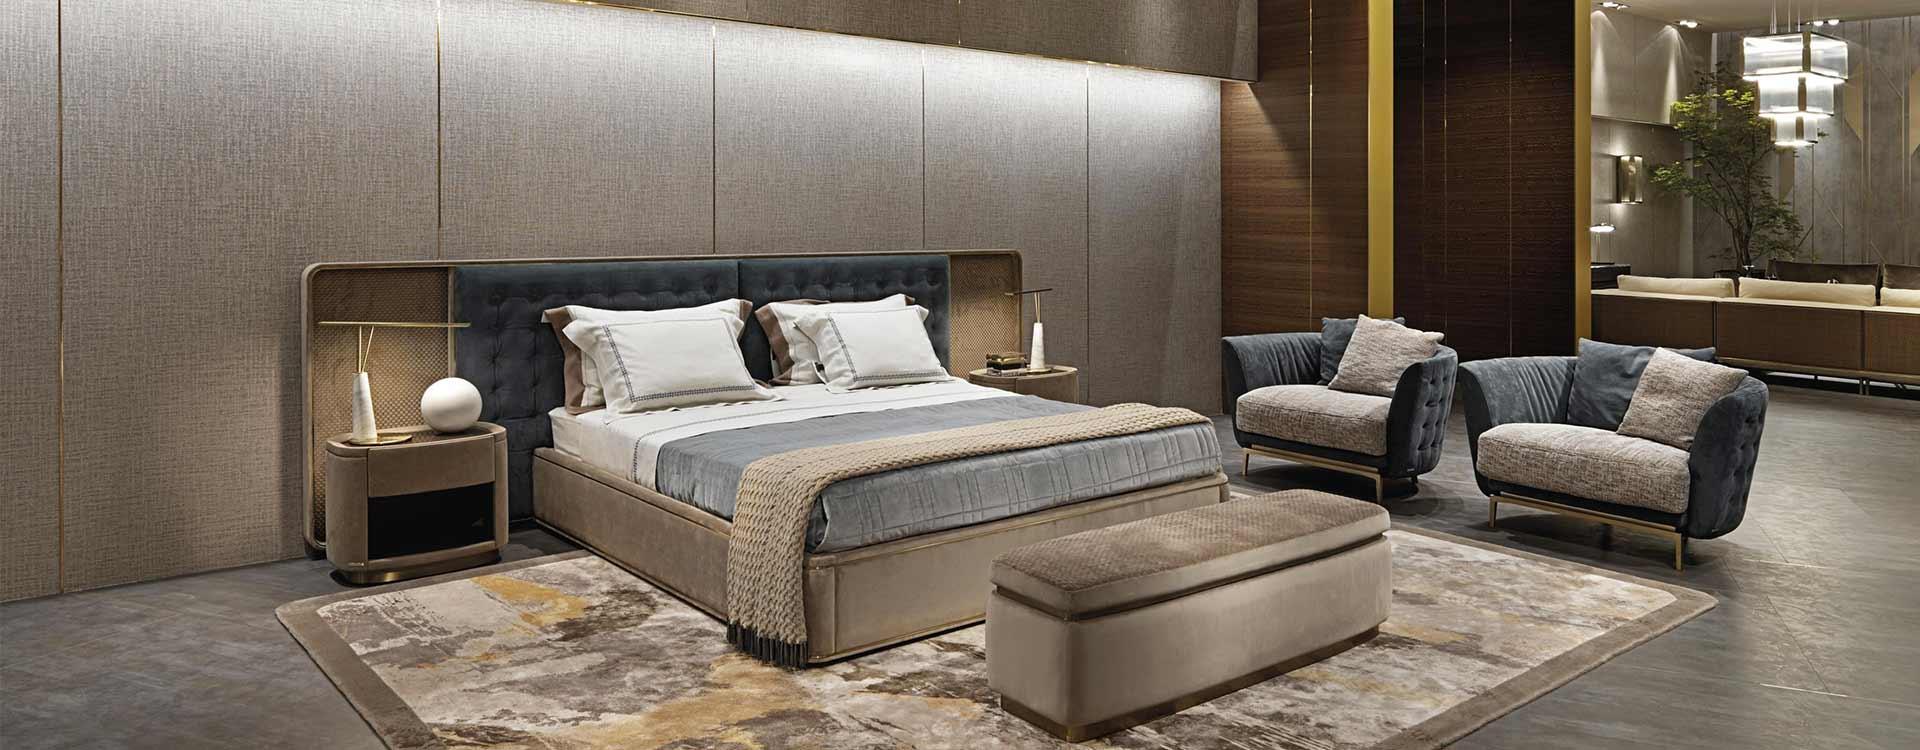 Luxury Lifestyle Furniture | Italian Furniture Store in